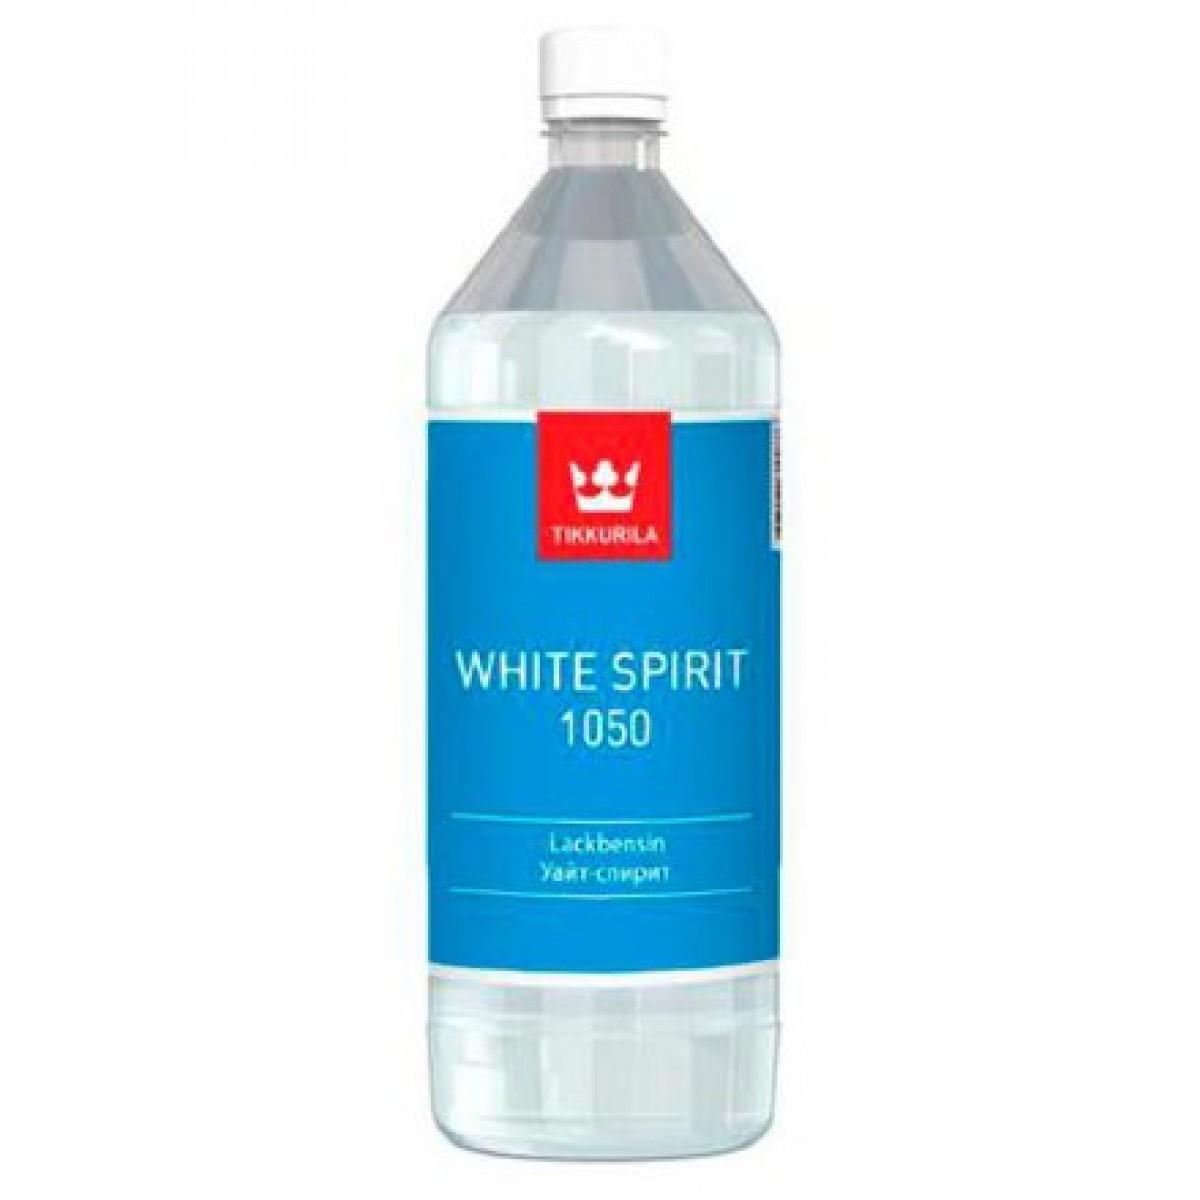 Растворитель Tikkurila White-spirit 1050 1 л